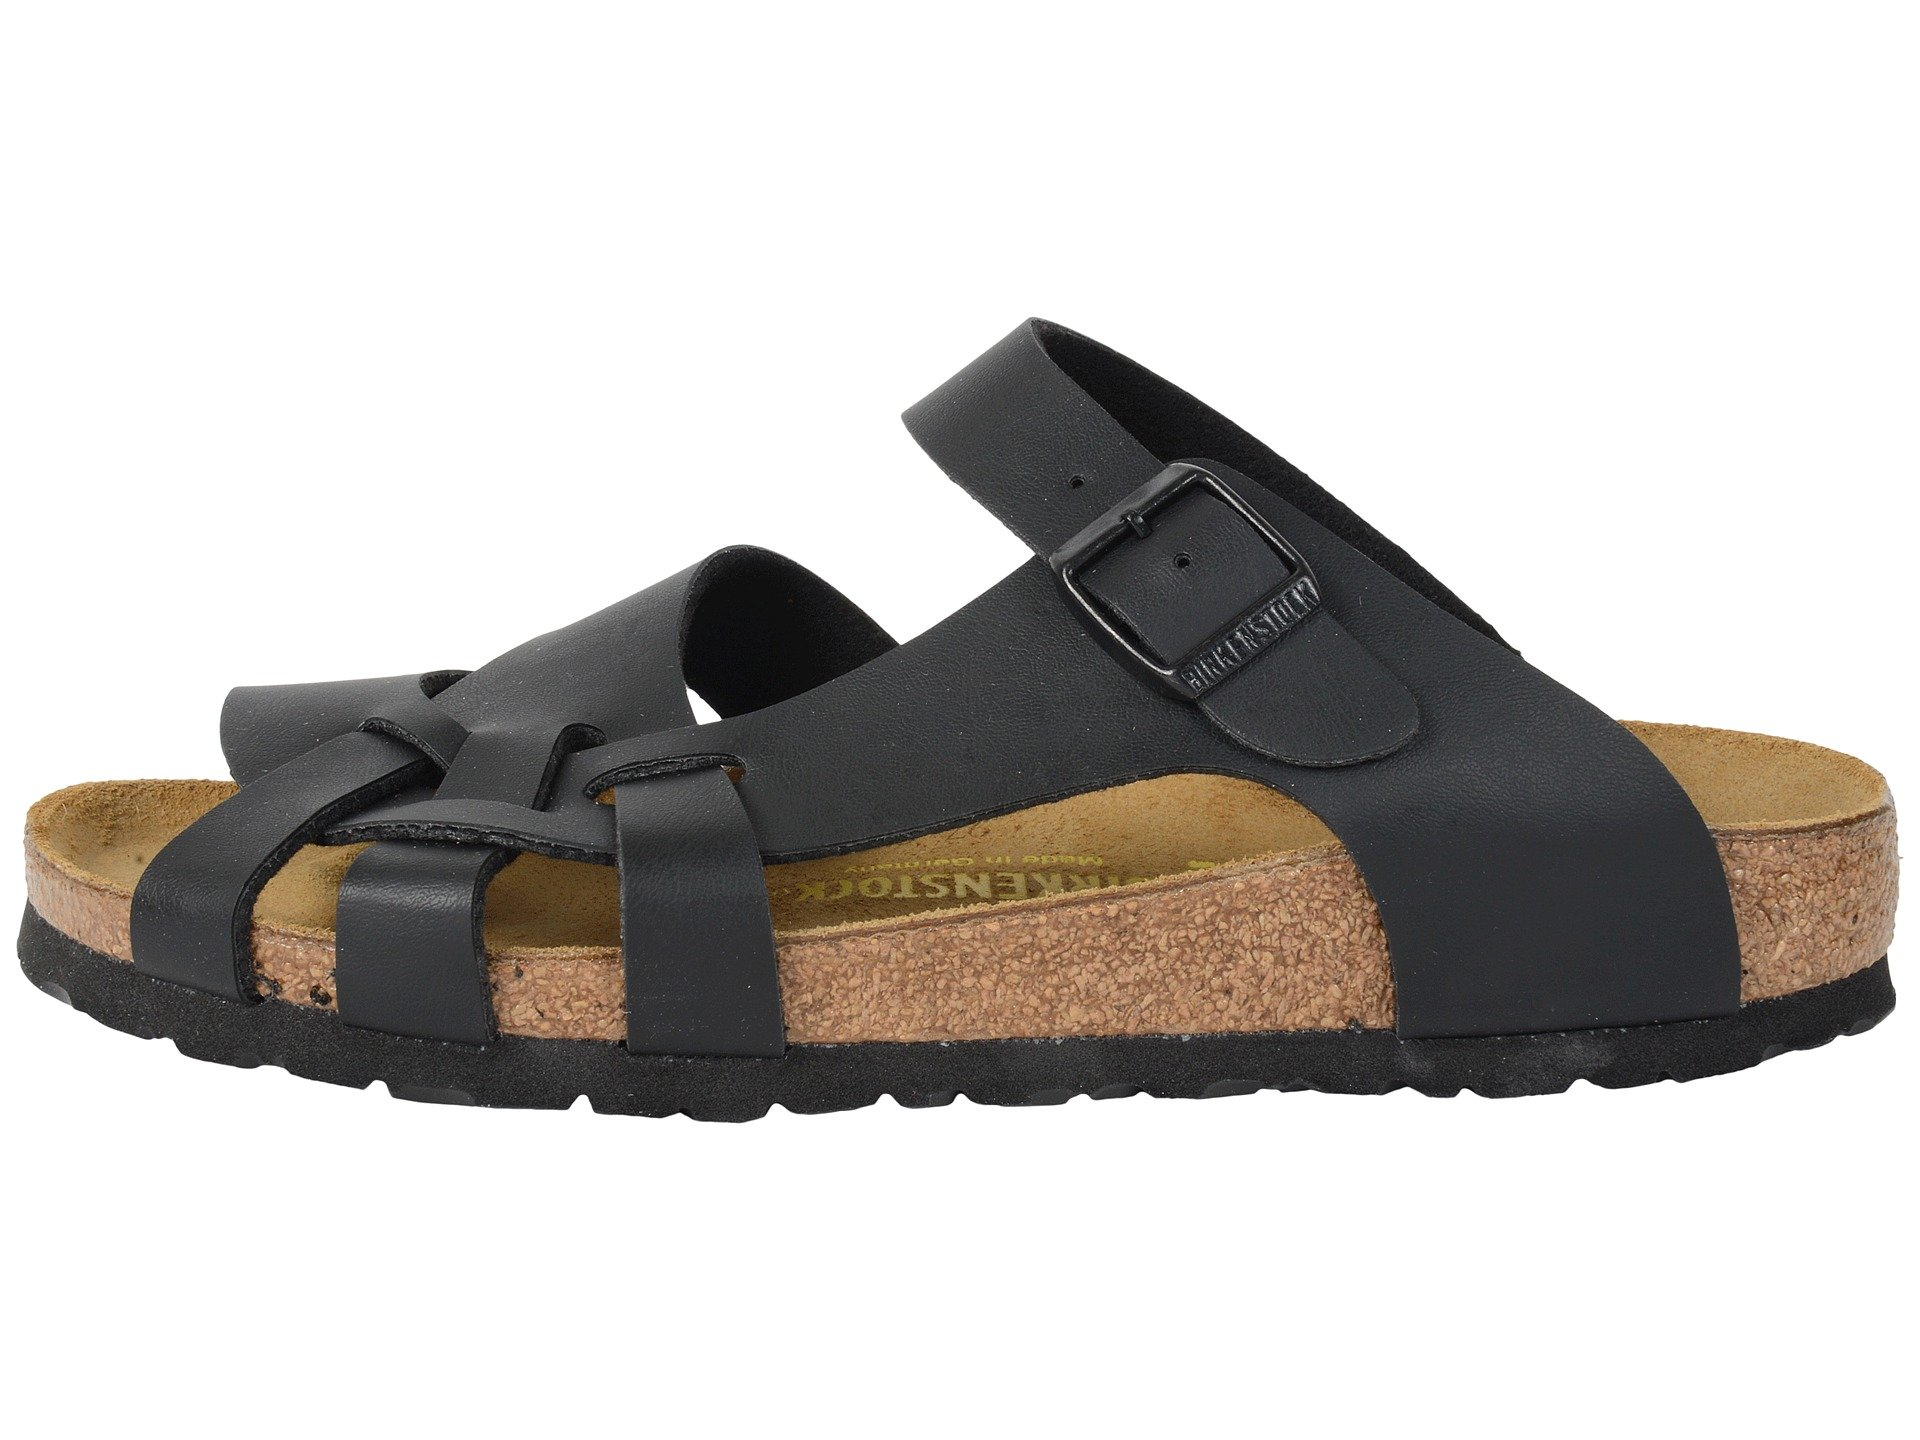 23e166869e9 Shipping Birkenstock Mayari Clearance Shoe Name Brands